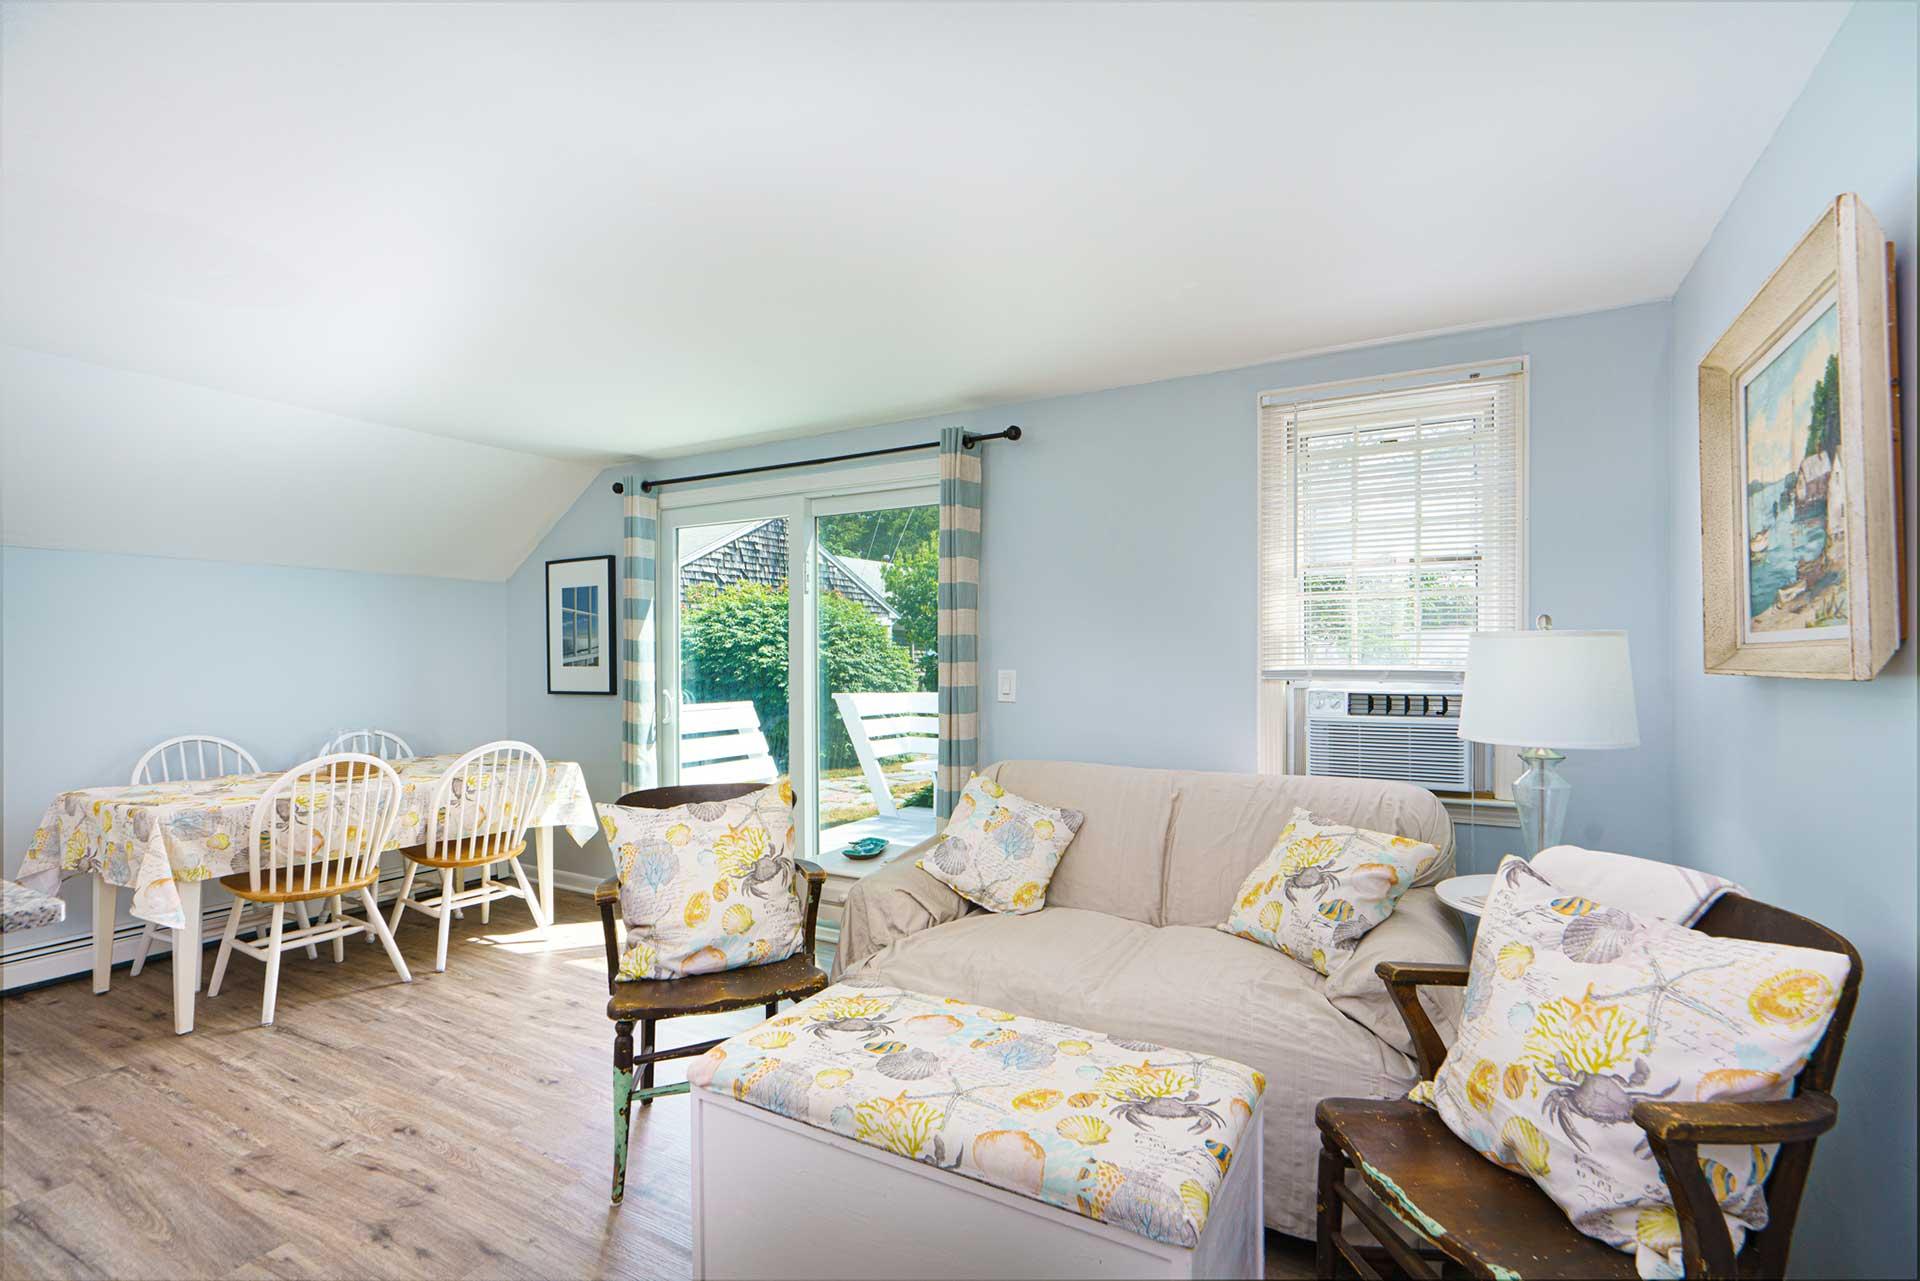 2 Bedroom Cape Cod Cottage Living Room